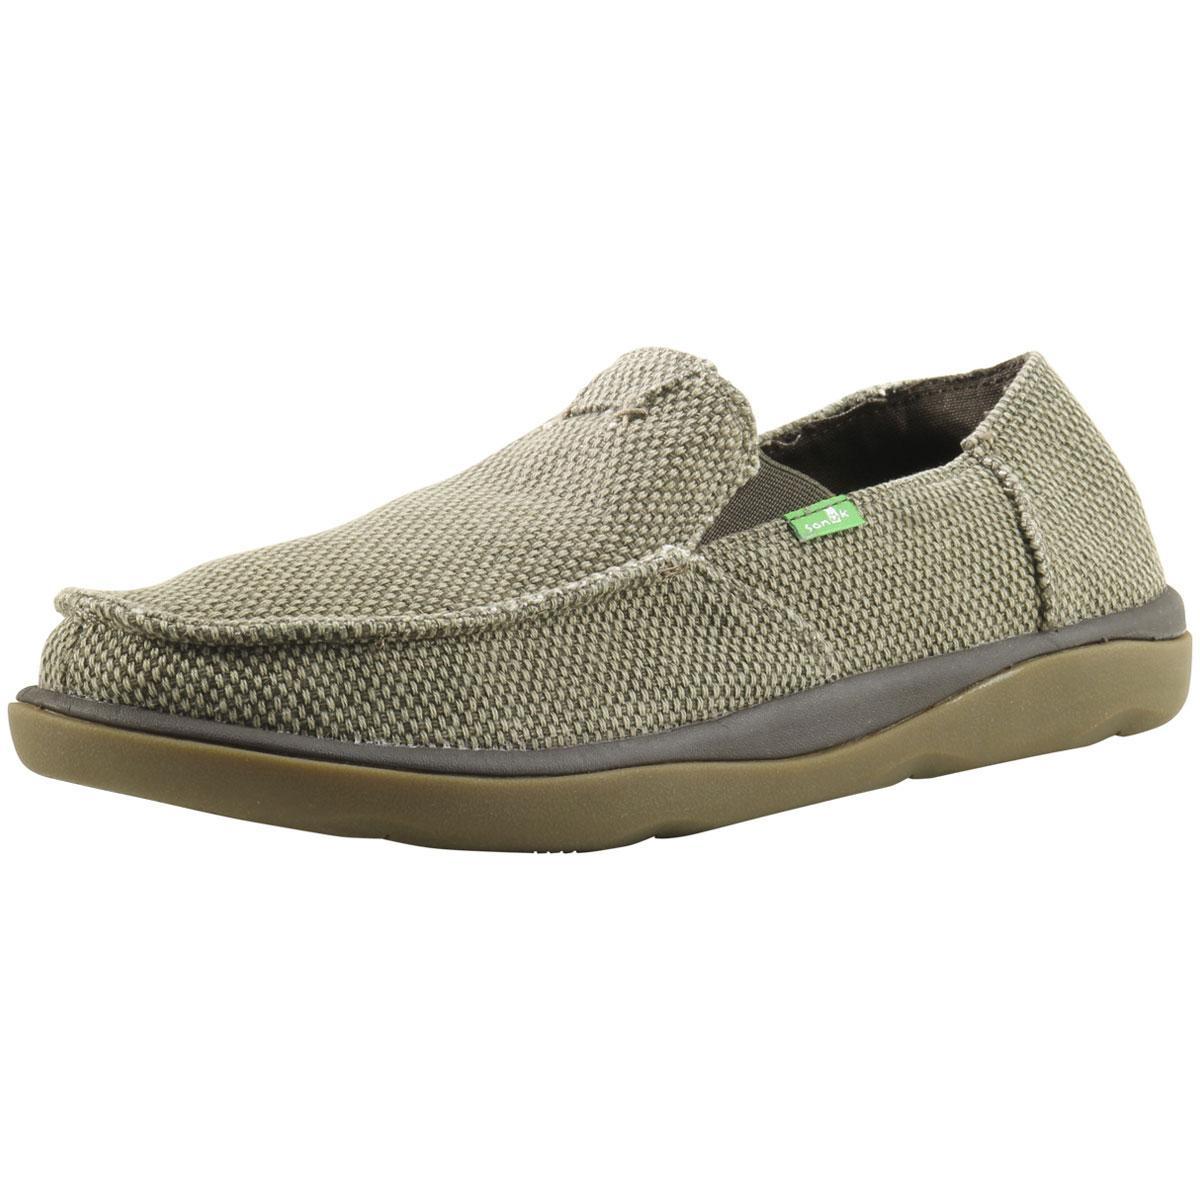 e5dd2f8d7bf Sanuk Men s Vagabond Tripper Sidewalk Surfer Loafers Shoes